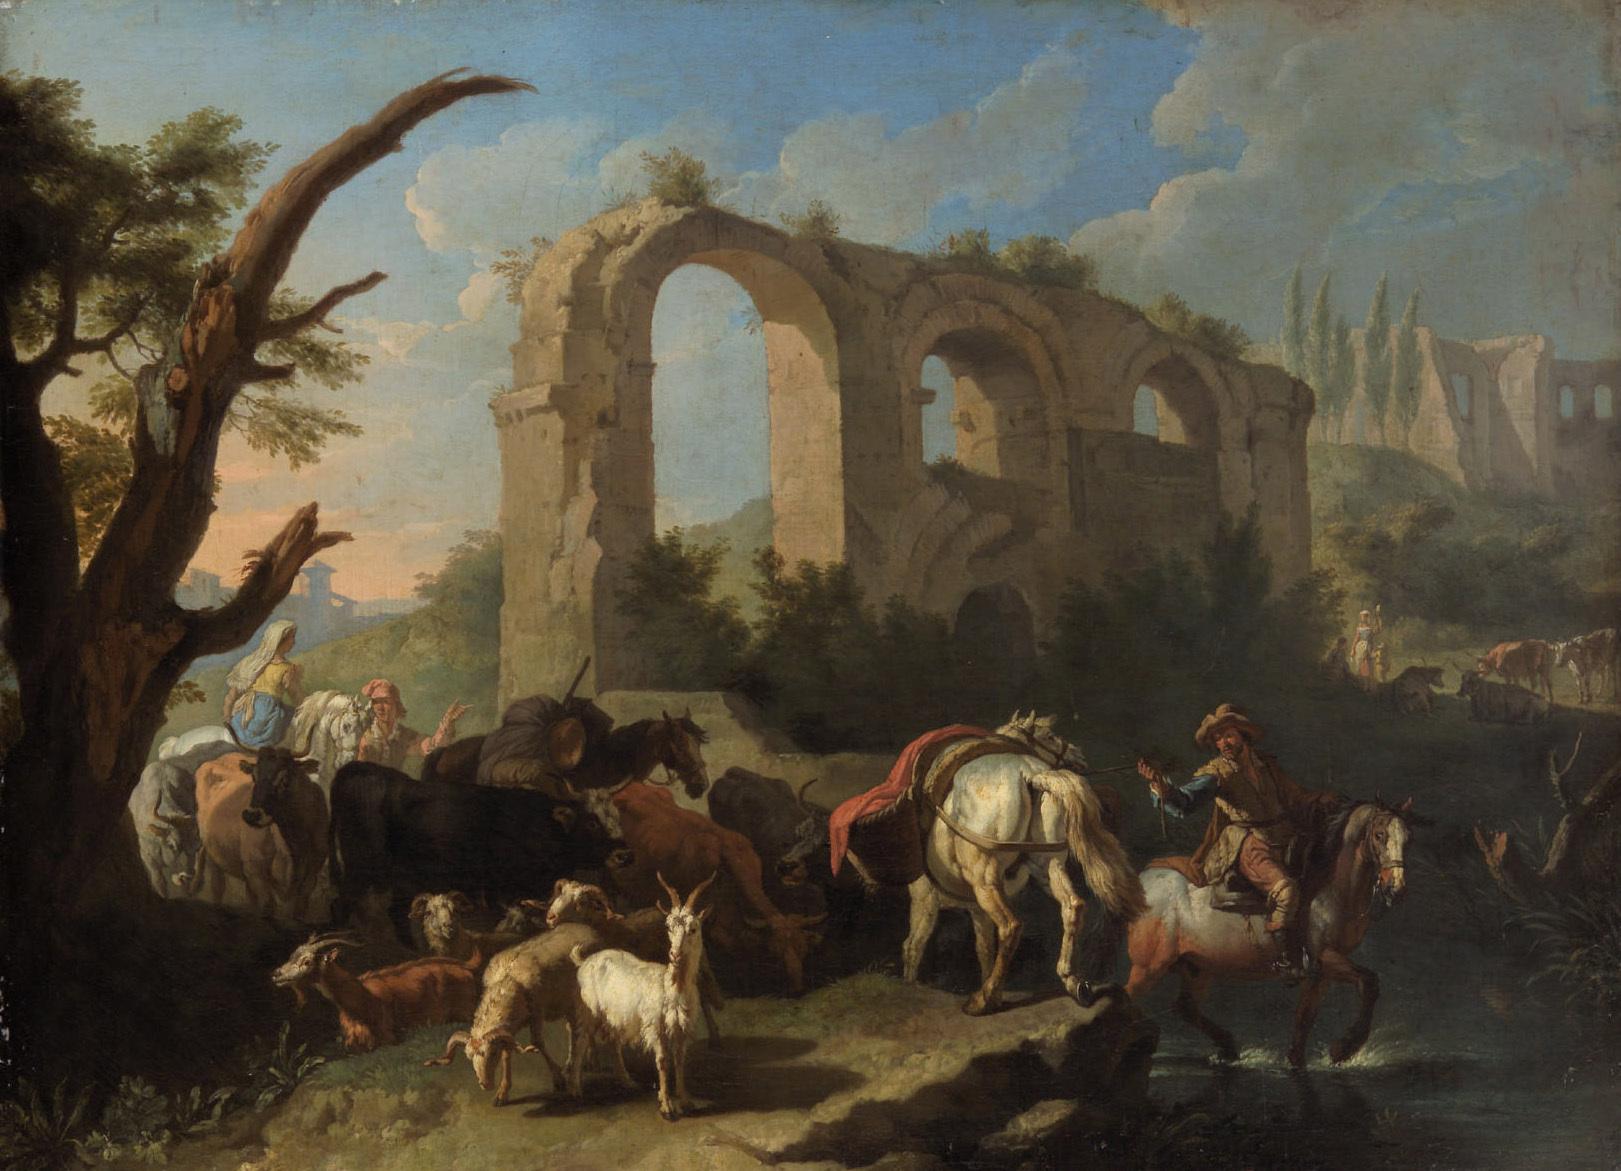 Italienische Landschaft mit Pferden und Hirten von Peeter van Bloemen gen. Standart